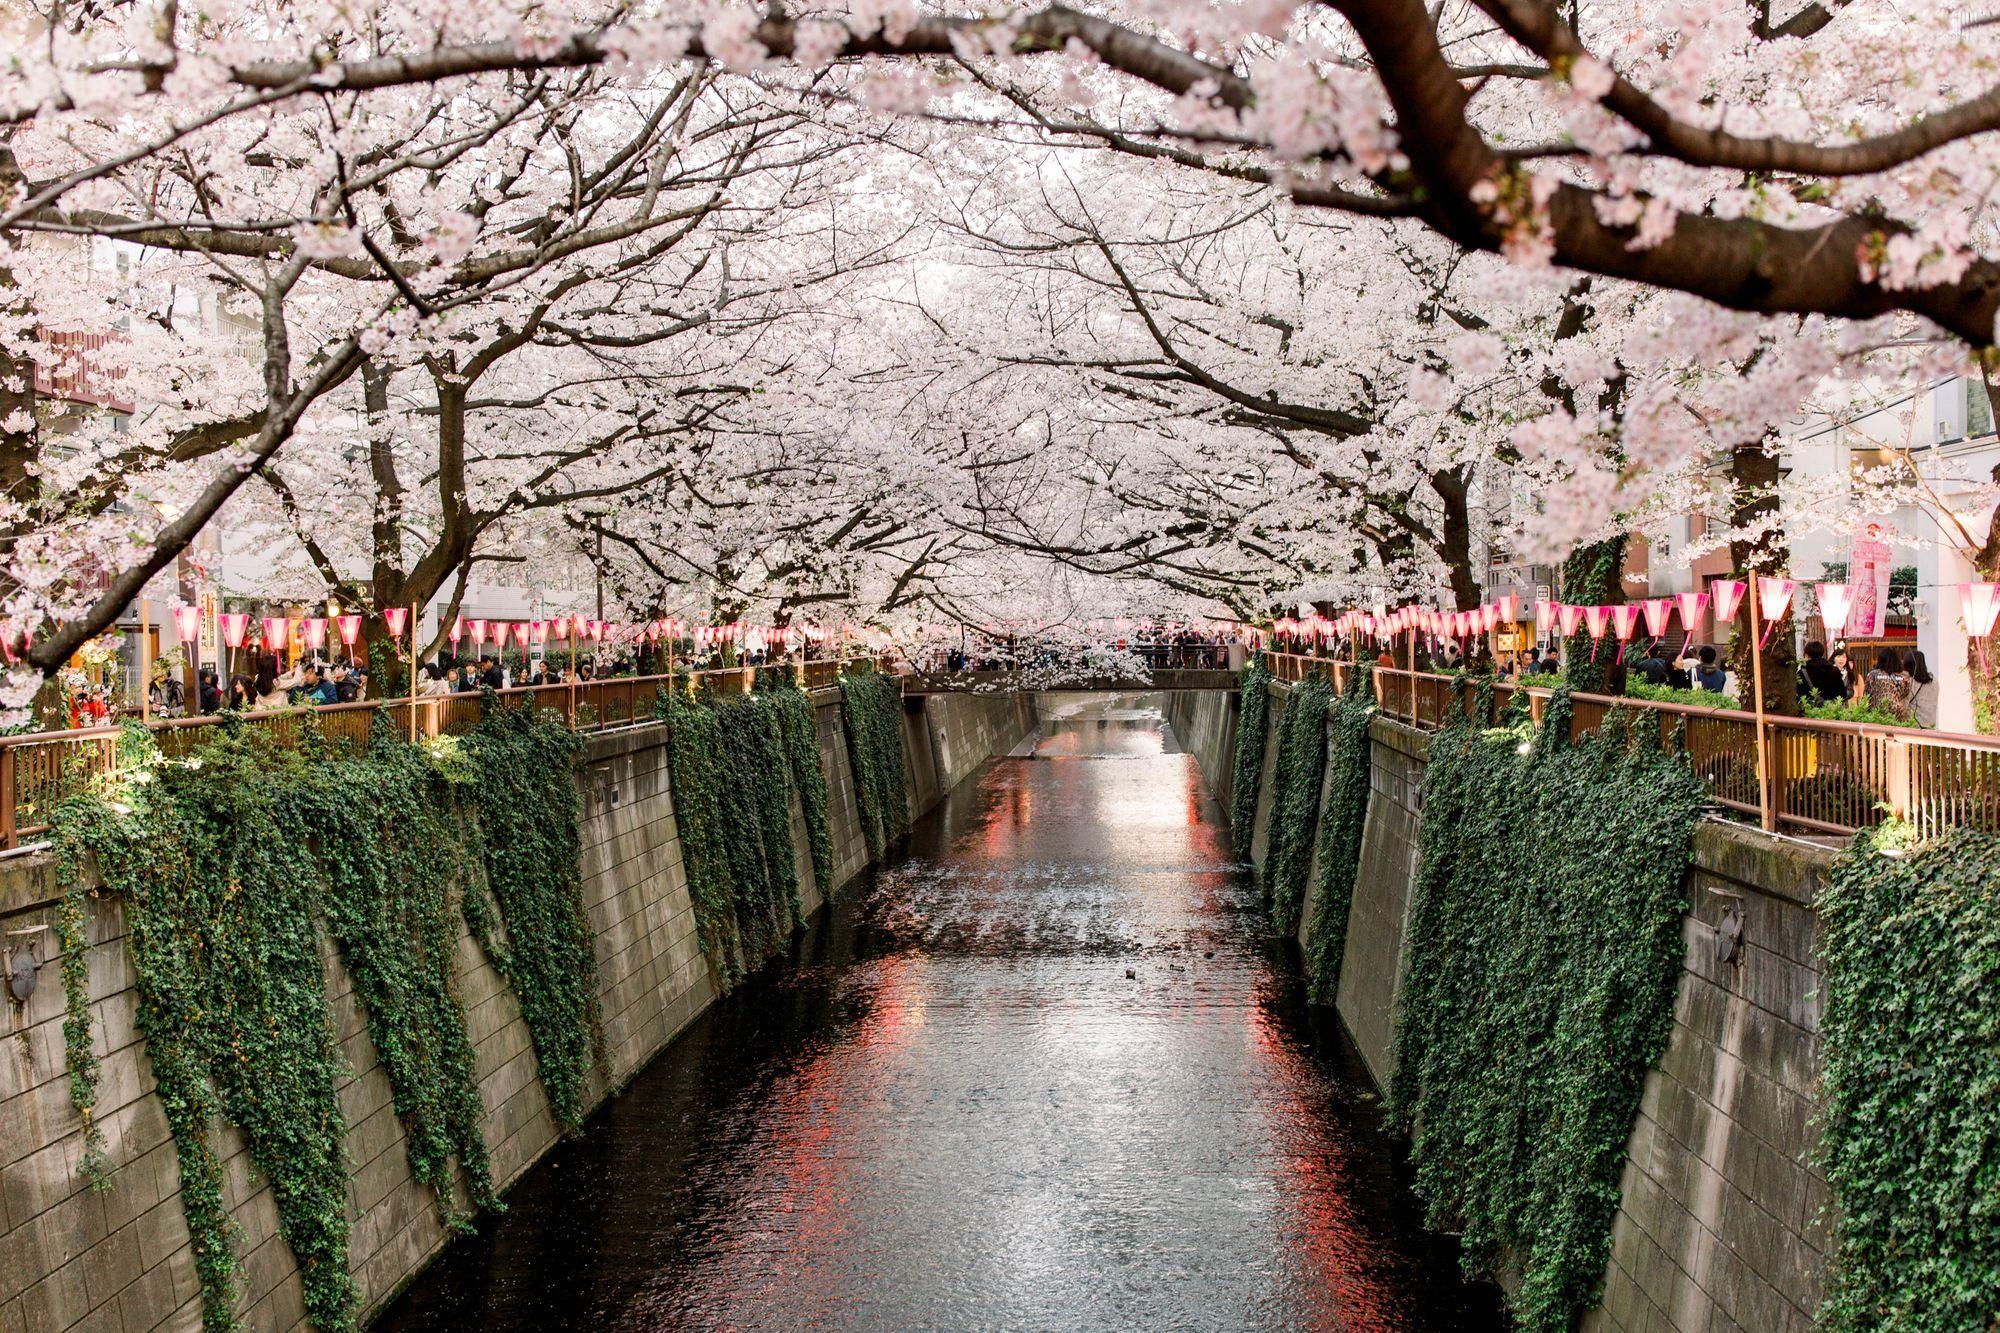 Japan Cherry Blossoms Cherry Blossom Season Around The Worlds Cherry Blossom Background